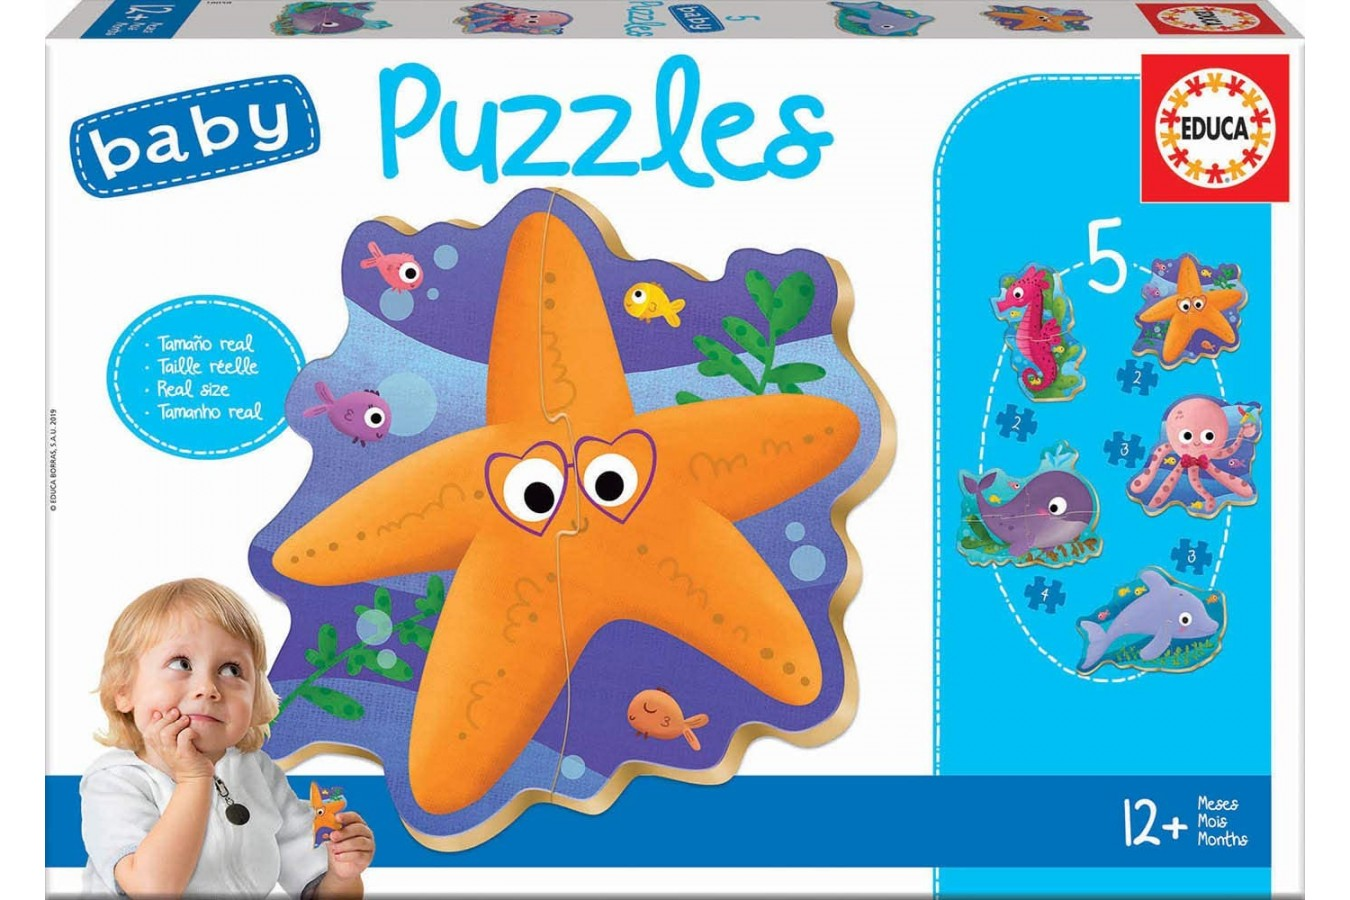 Puzzle Educa - 5 Baby Puzzles, 2/3/4 piese (18058)